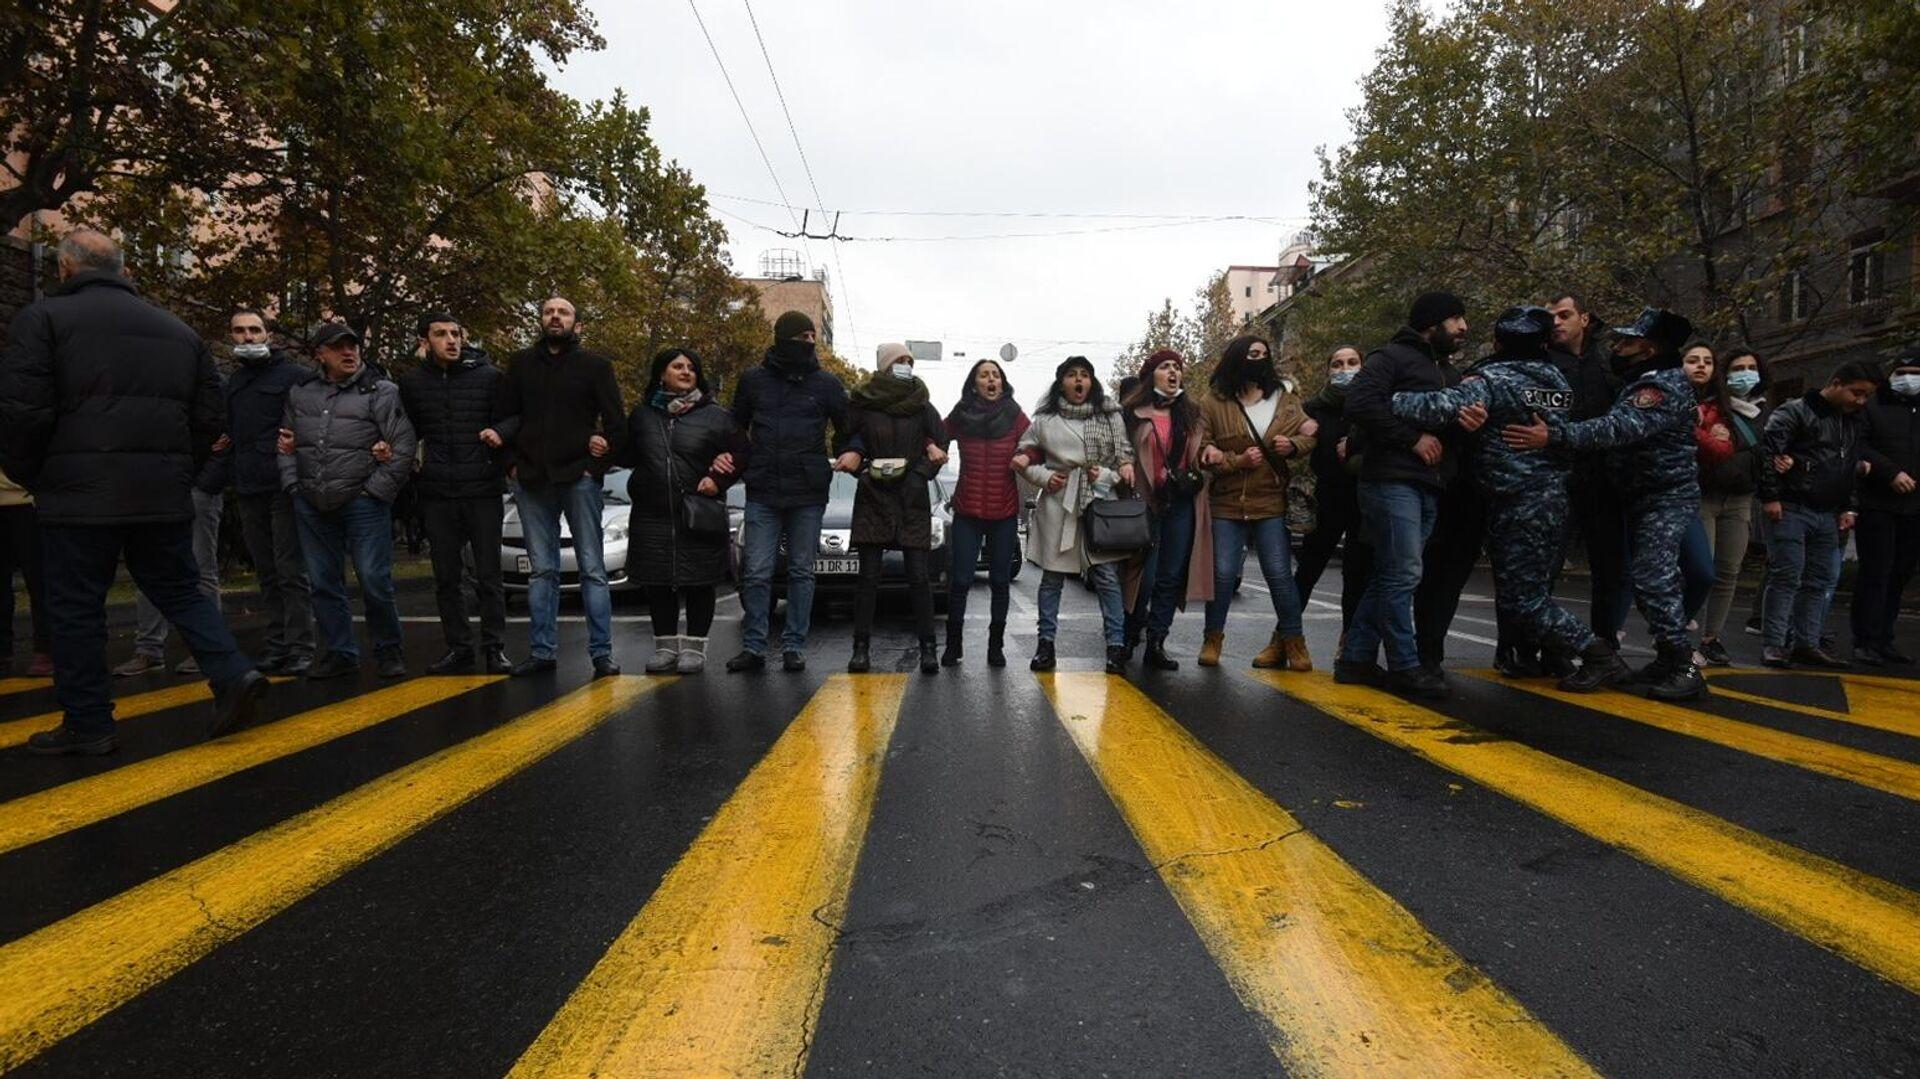 Акция протеста оппозиции в Ереване. 8 декабря 2020 - РИА Новости, 1920, 08.12.2020